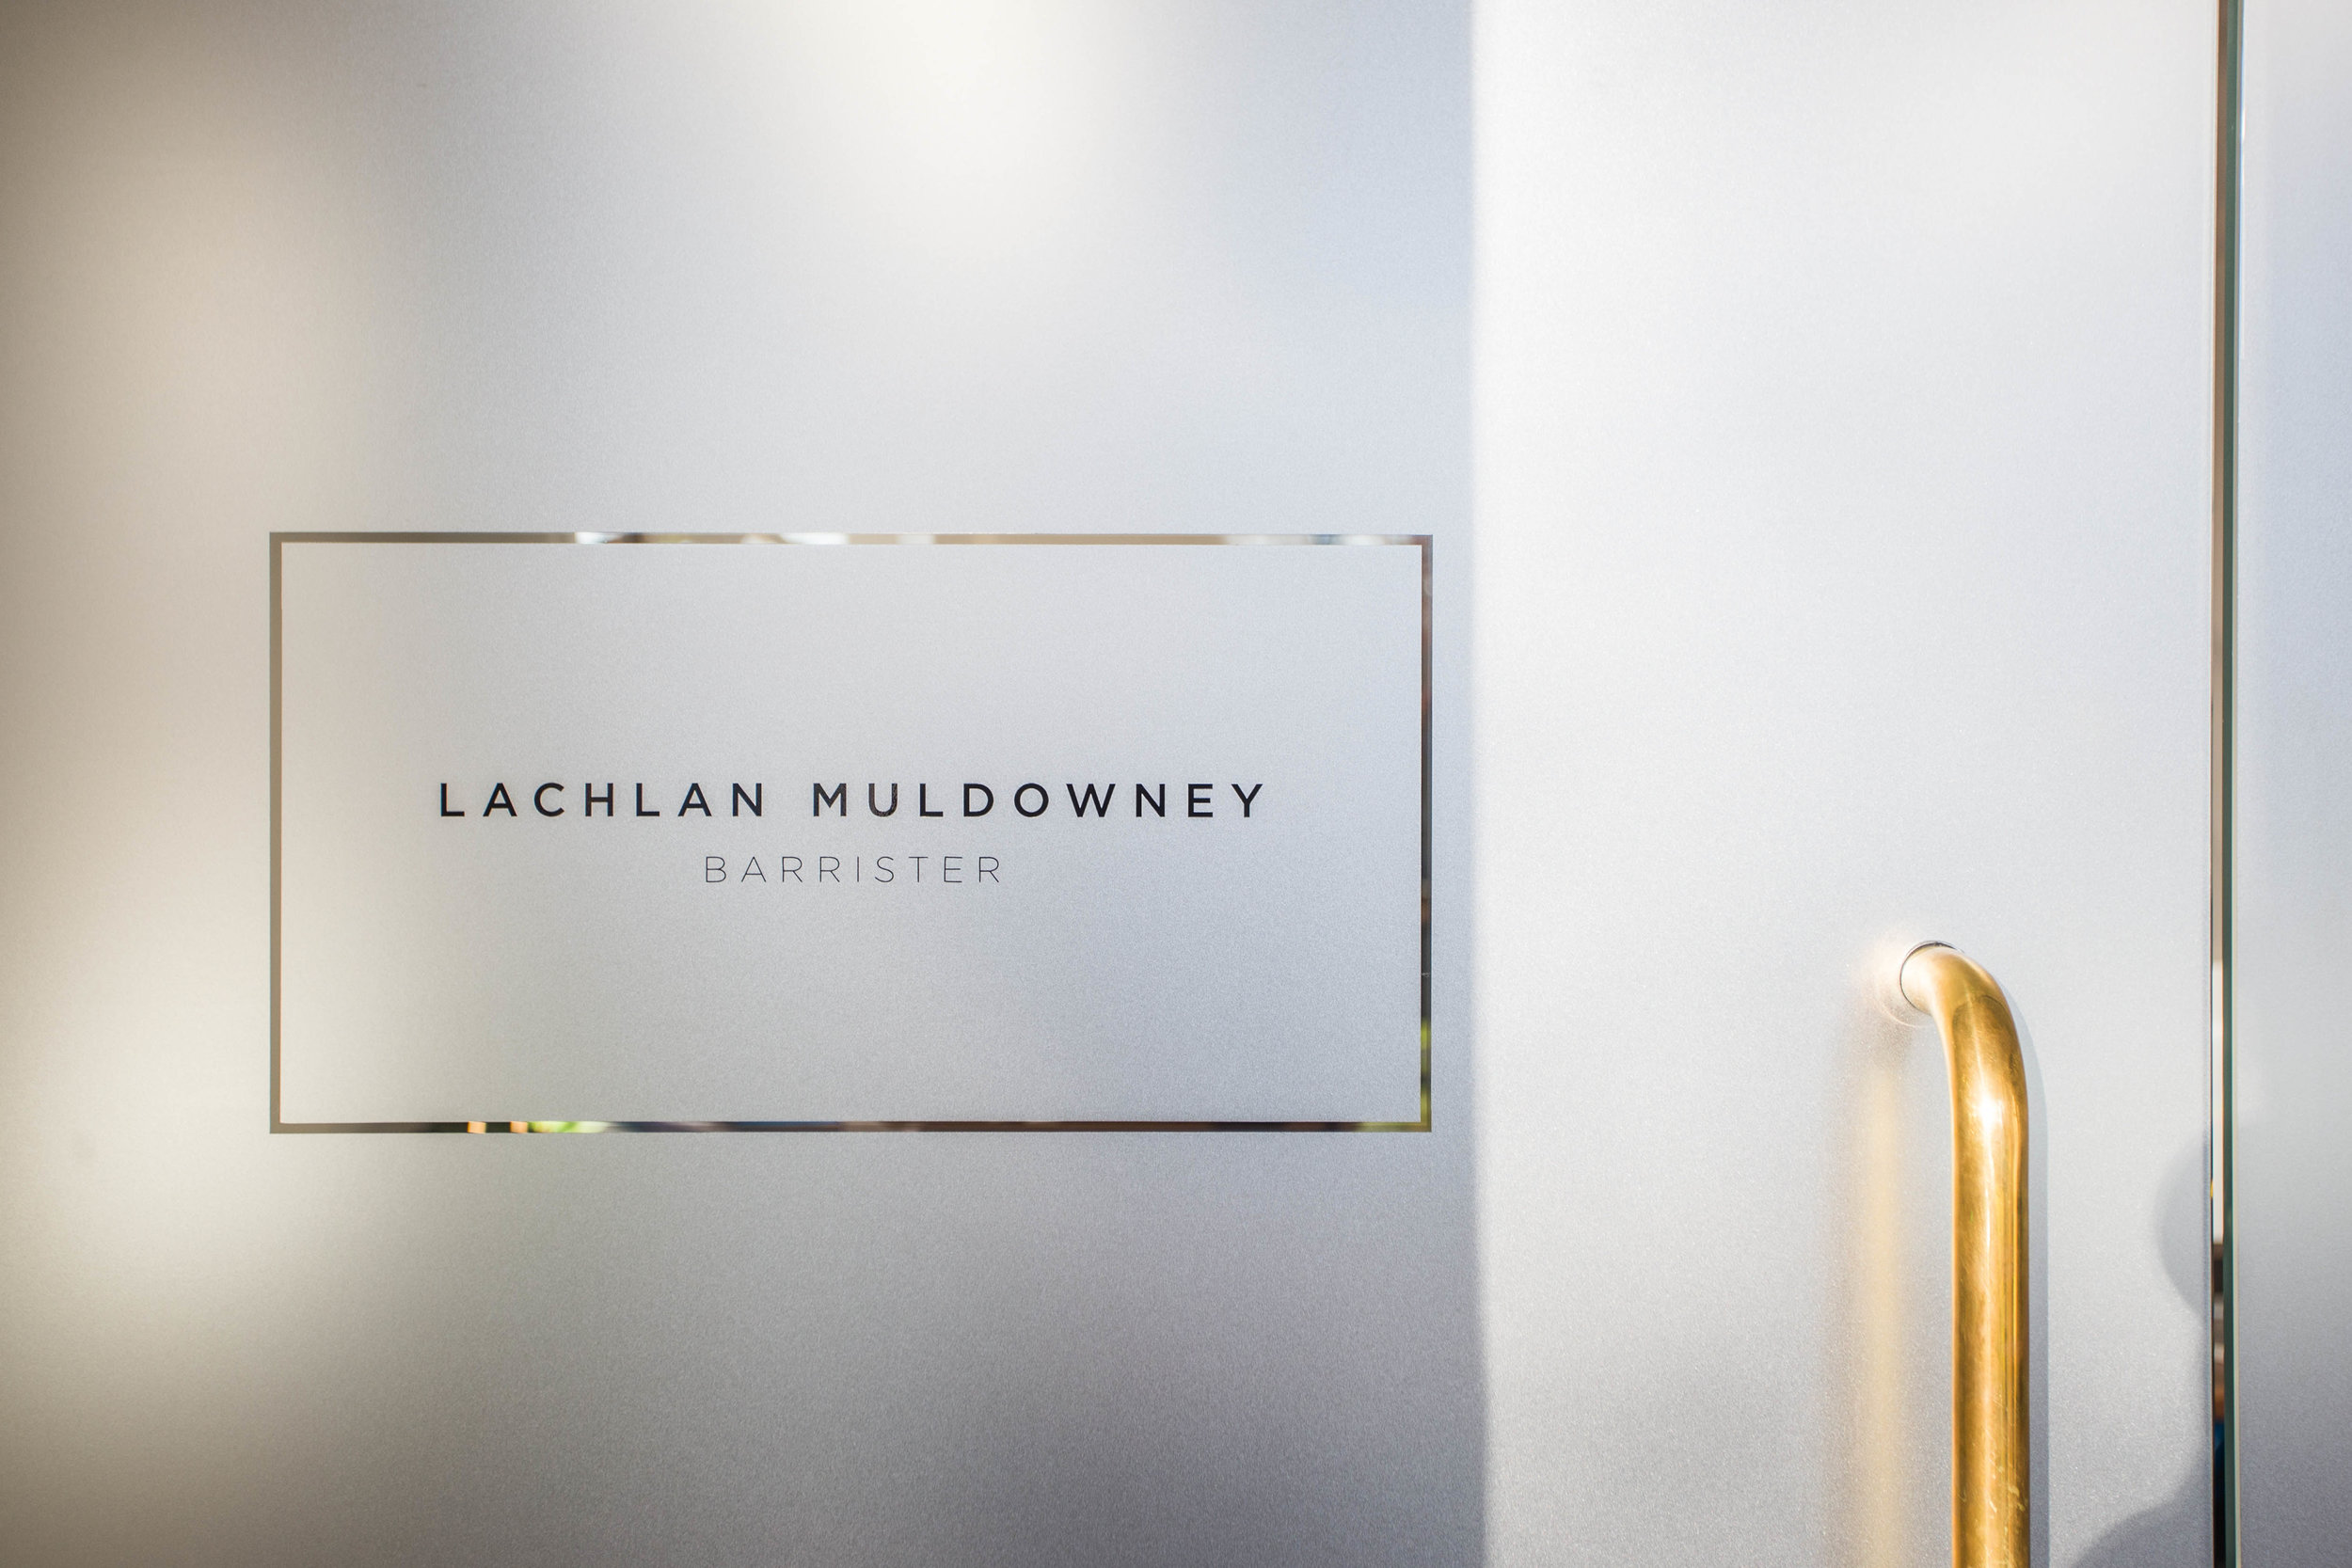 Commercial Interiors | Branding | Website design - Lachlan Muldowney